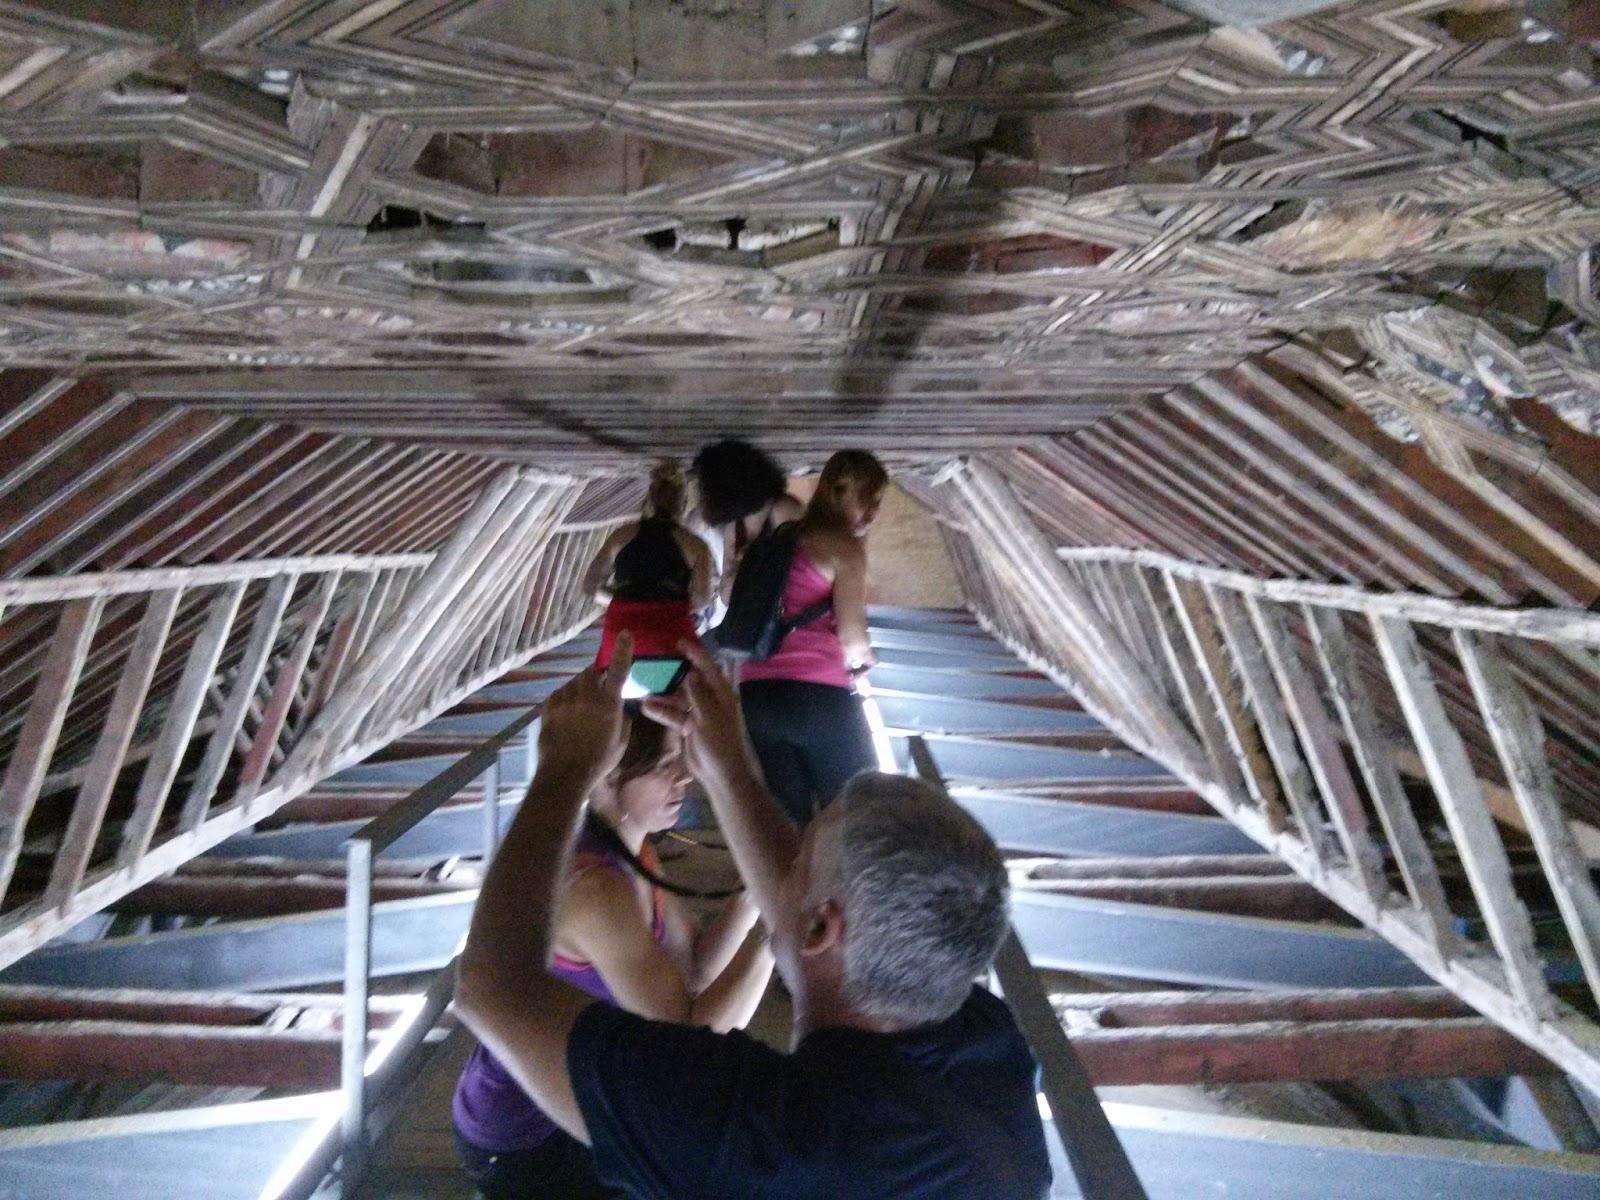 Oficina de turismo de carmona carmona oculta 2015 for Oficina turismo carmona